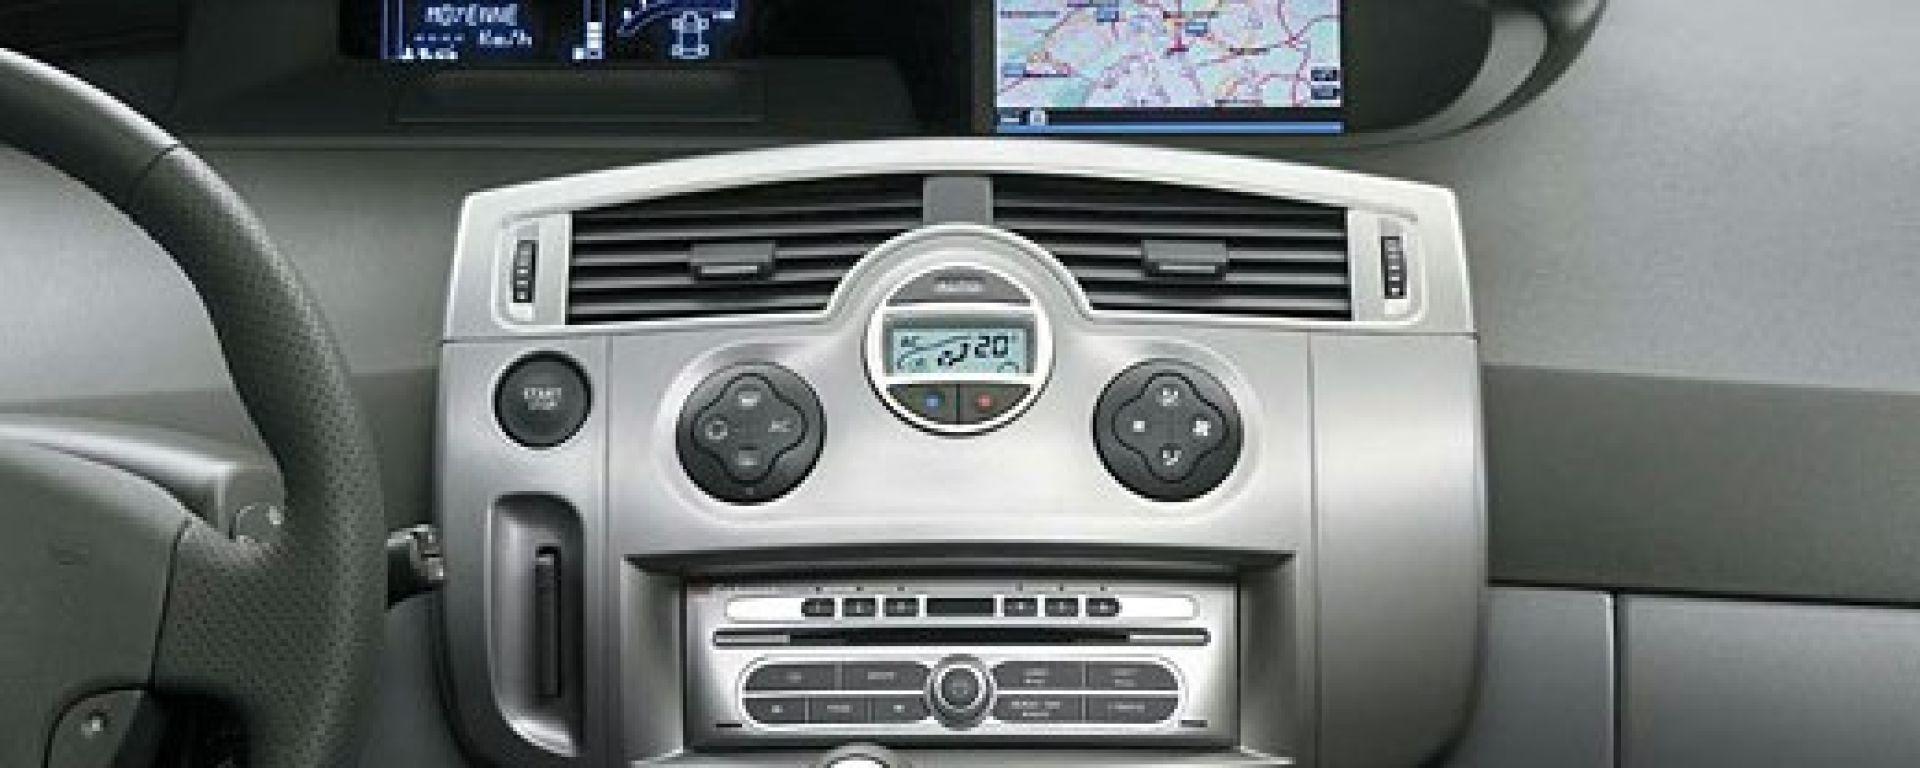 Renault Nuova Grand Scénic 5 posti